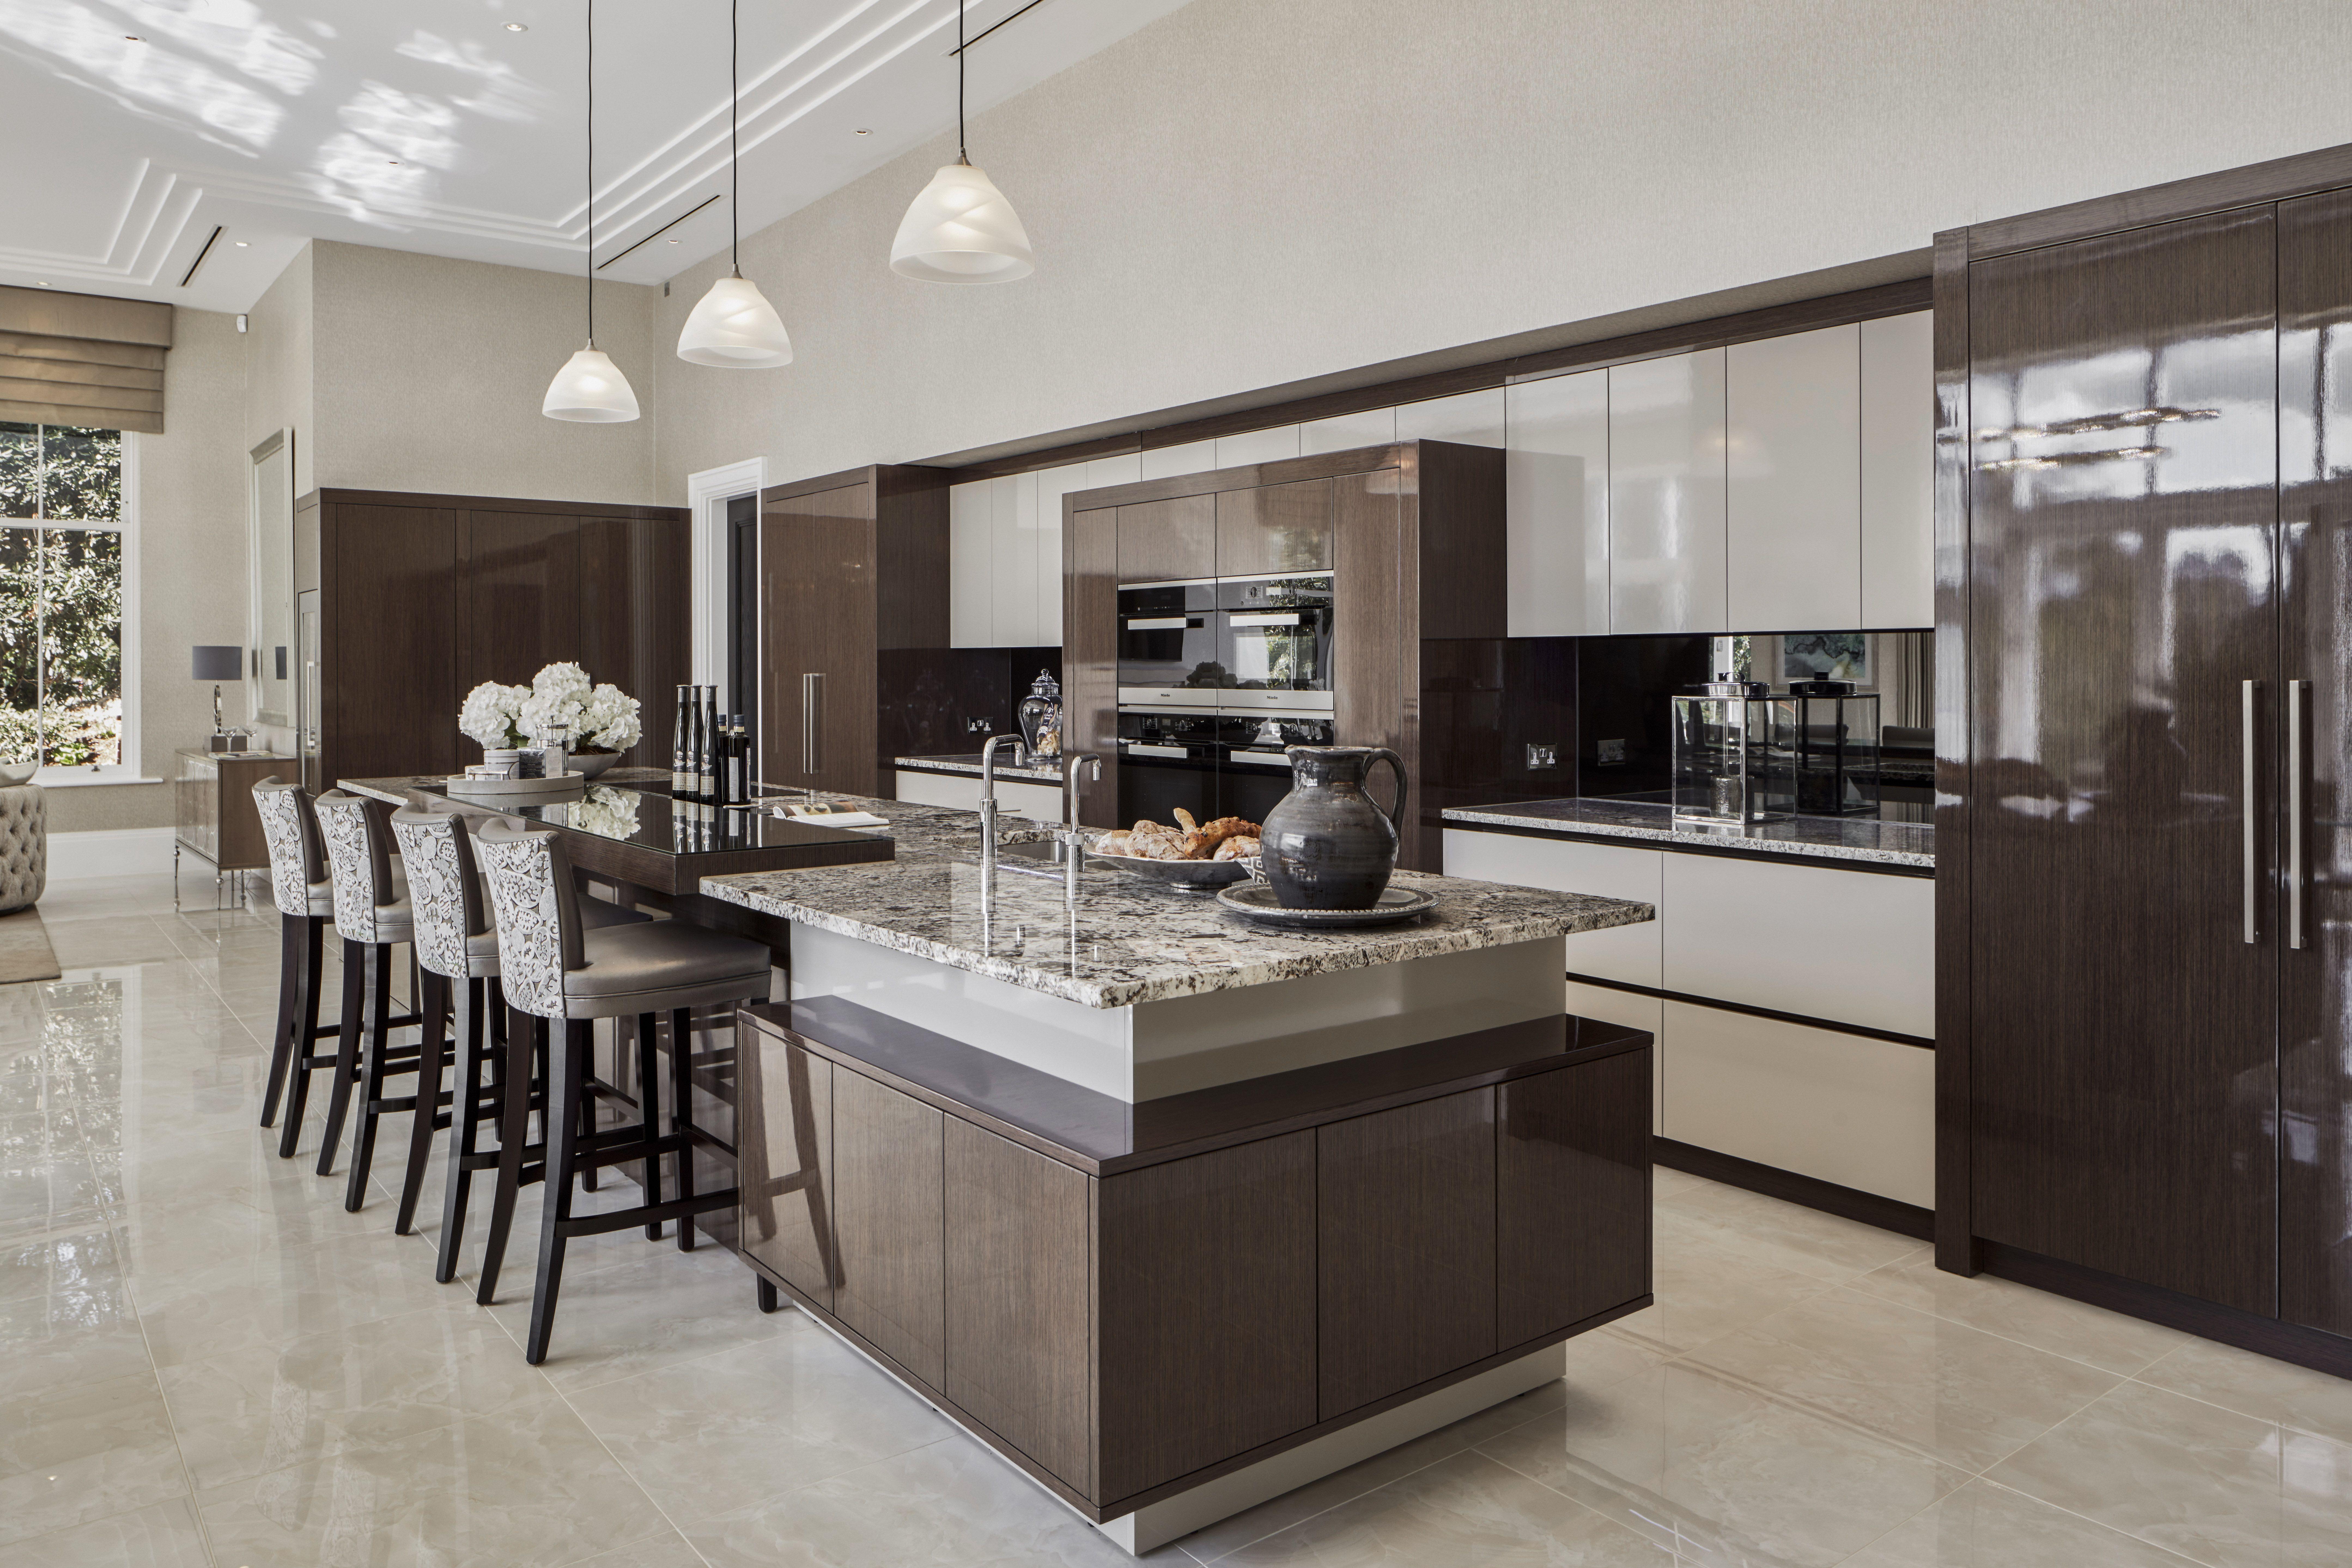 EXTREME High Gloss Luxury Kitchen Home decor kitchen